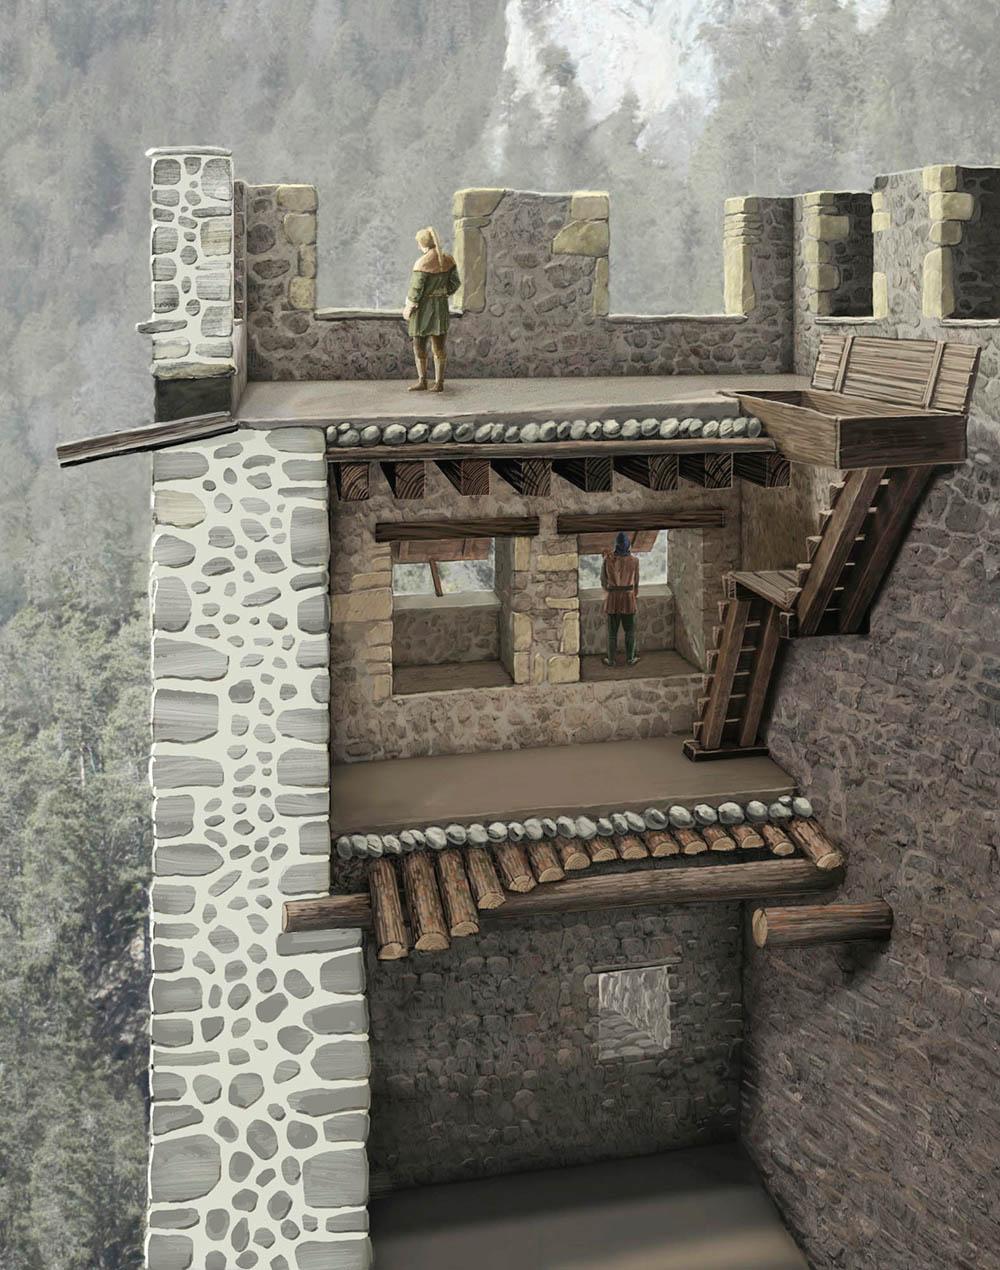 Belfort Turm Querschnitt